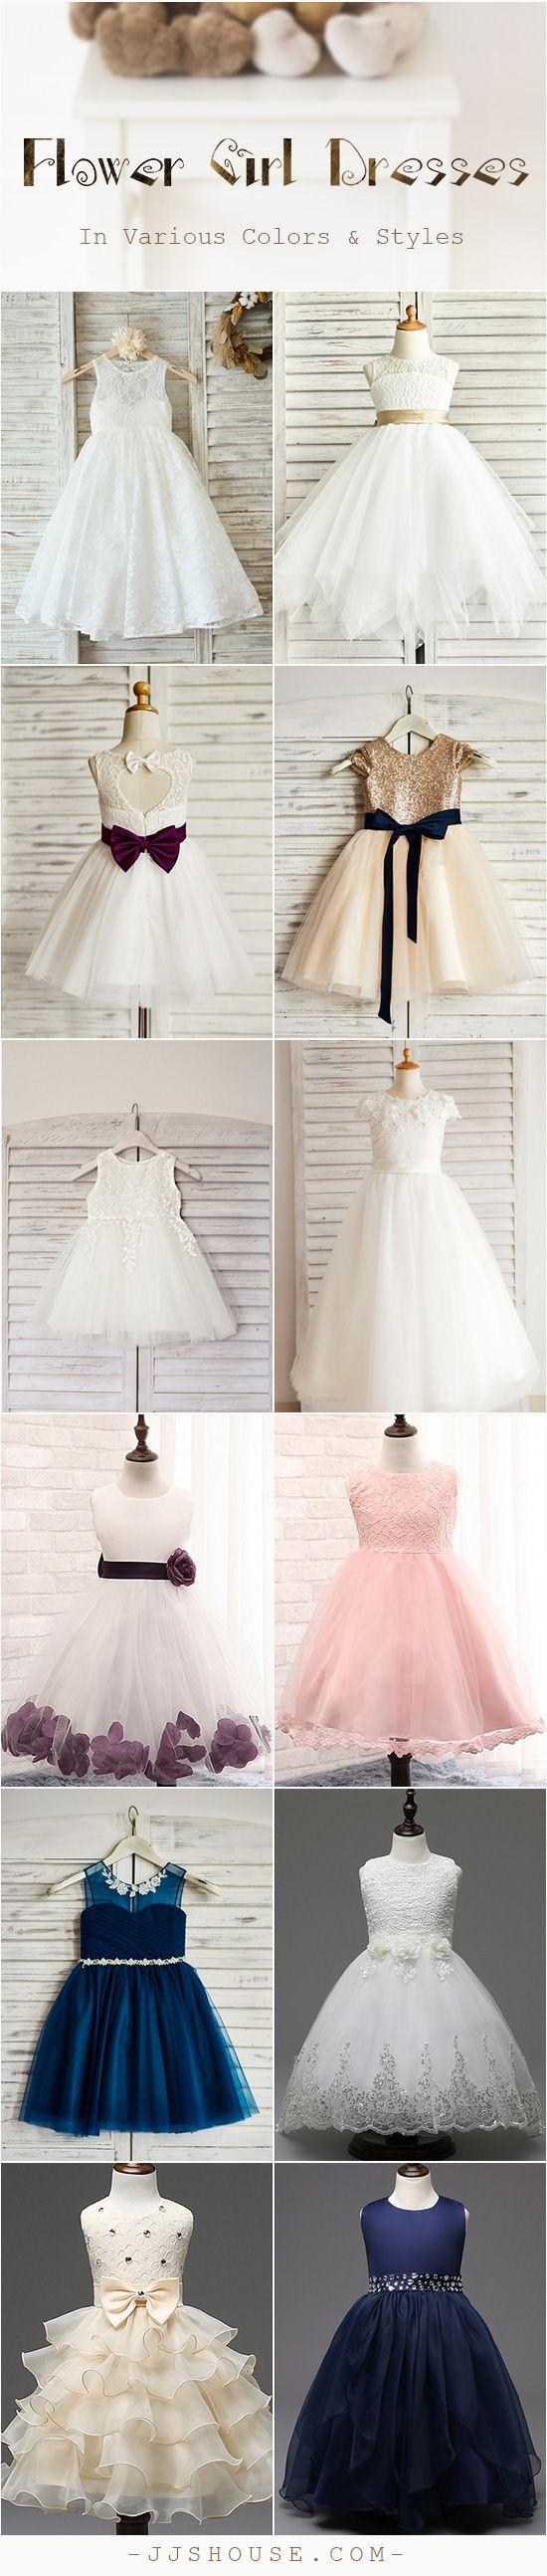 Flower Girl Dresses In Various Colors & Styles Choose one! #flowergirldress